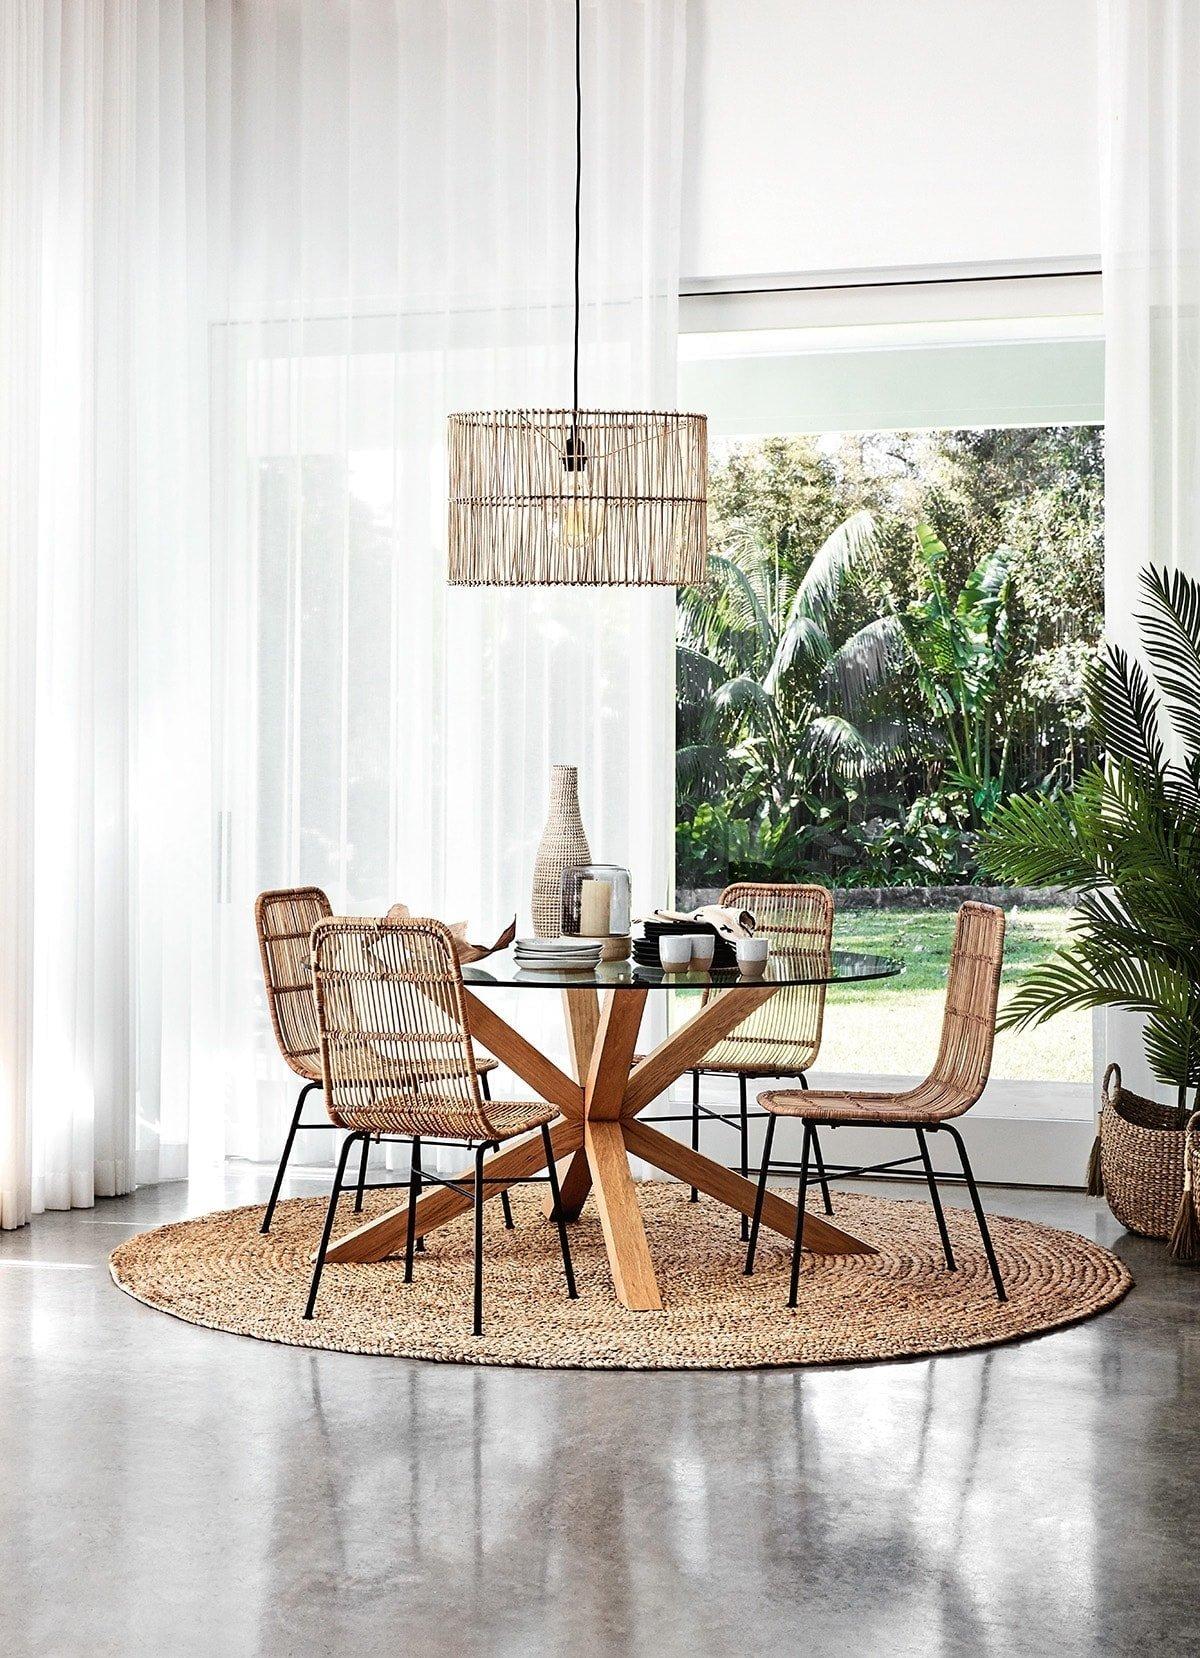 Rugs under Dining Tables: Expert Tips & Ideas - TLC Interiors